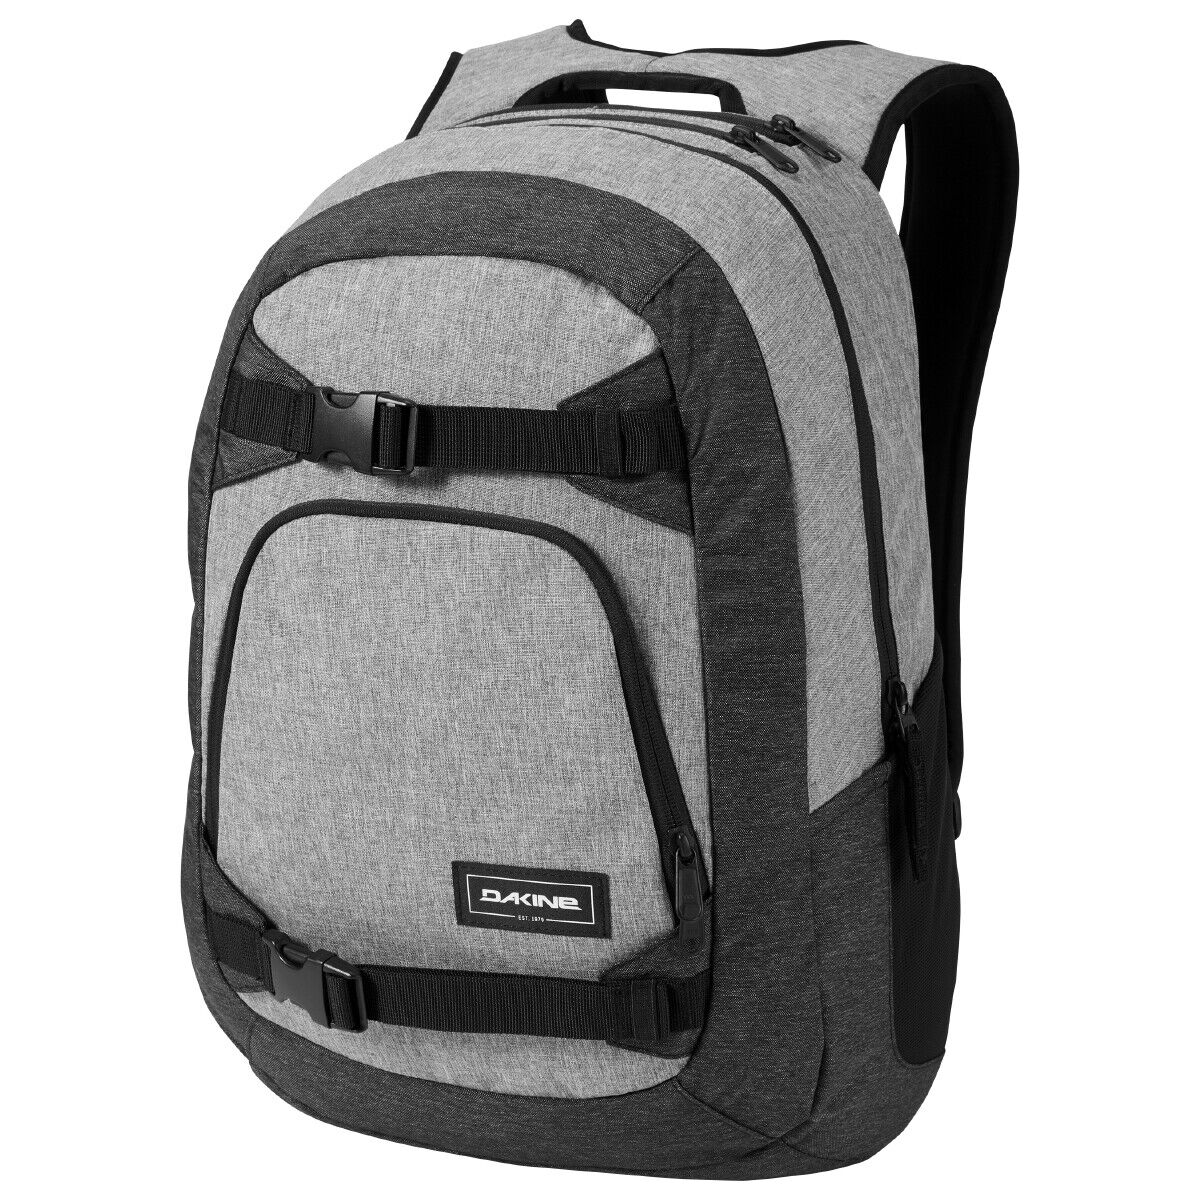 Dakine Explorer Rucksack 26L Schule Sport Laptop Backpack 10001447-grauSCALE